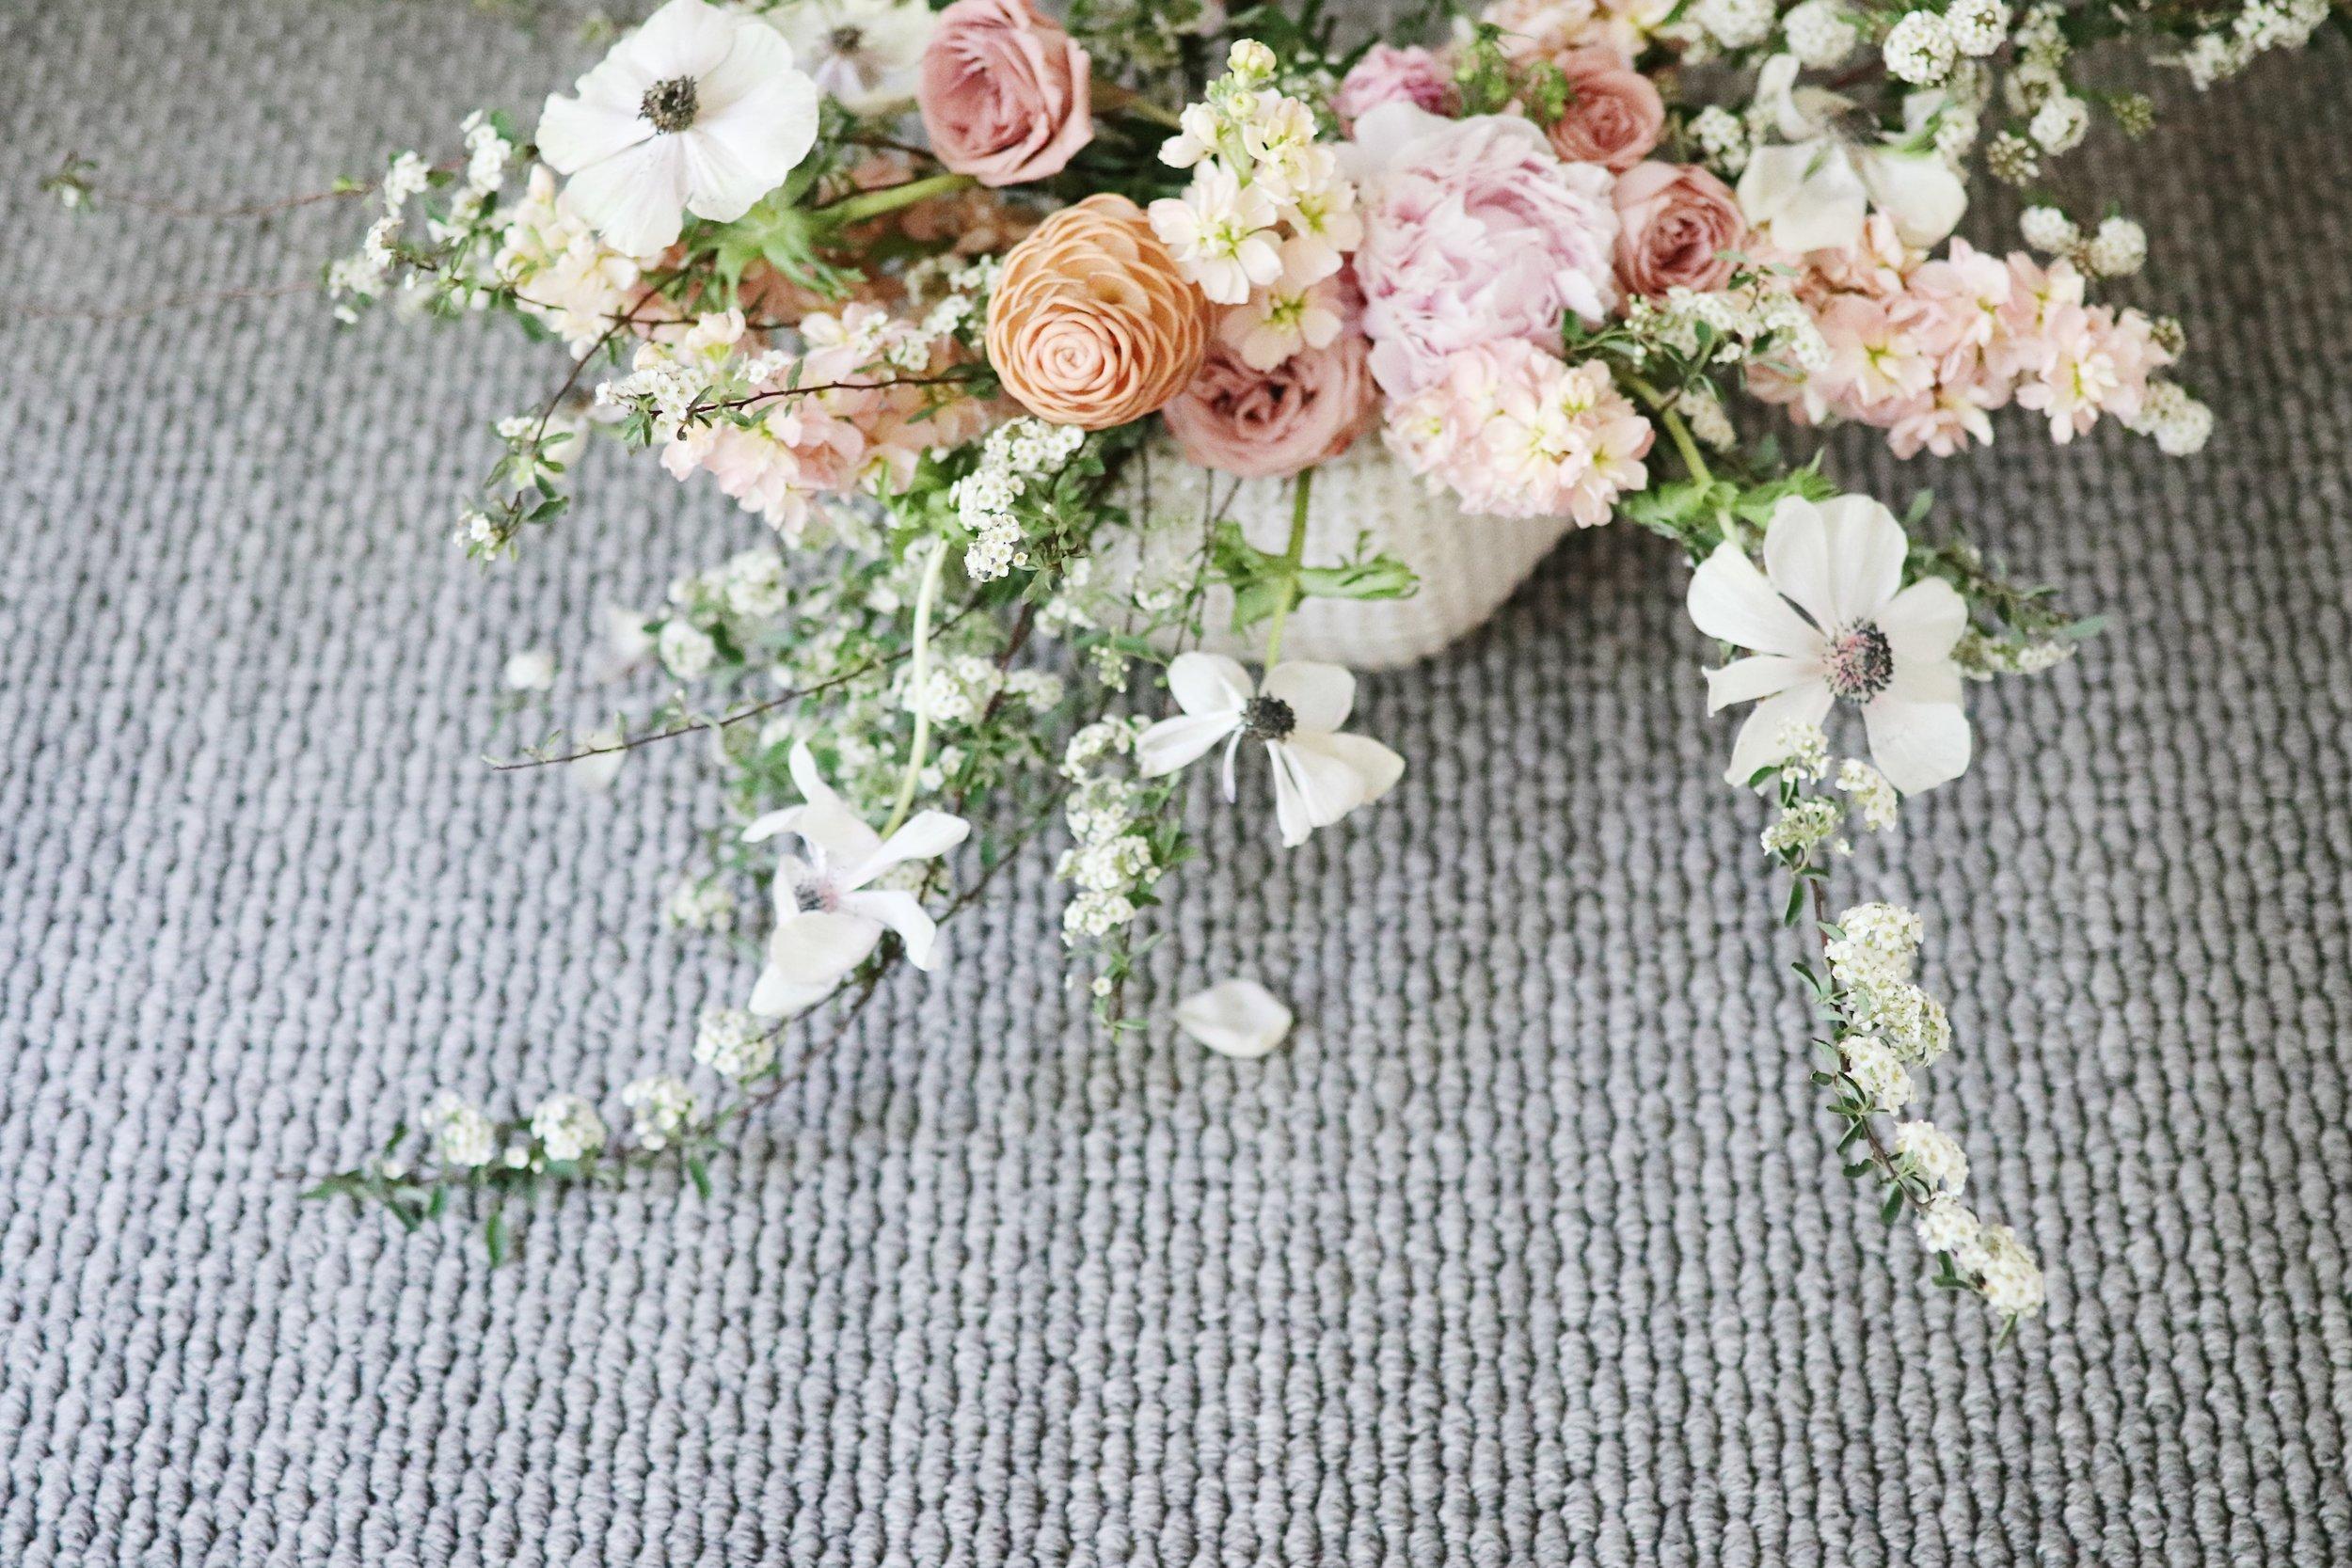 Dining Room Make over before after wall paper ballon garland organic flower arrangement peach blush white